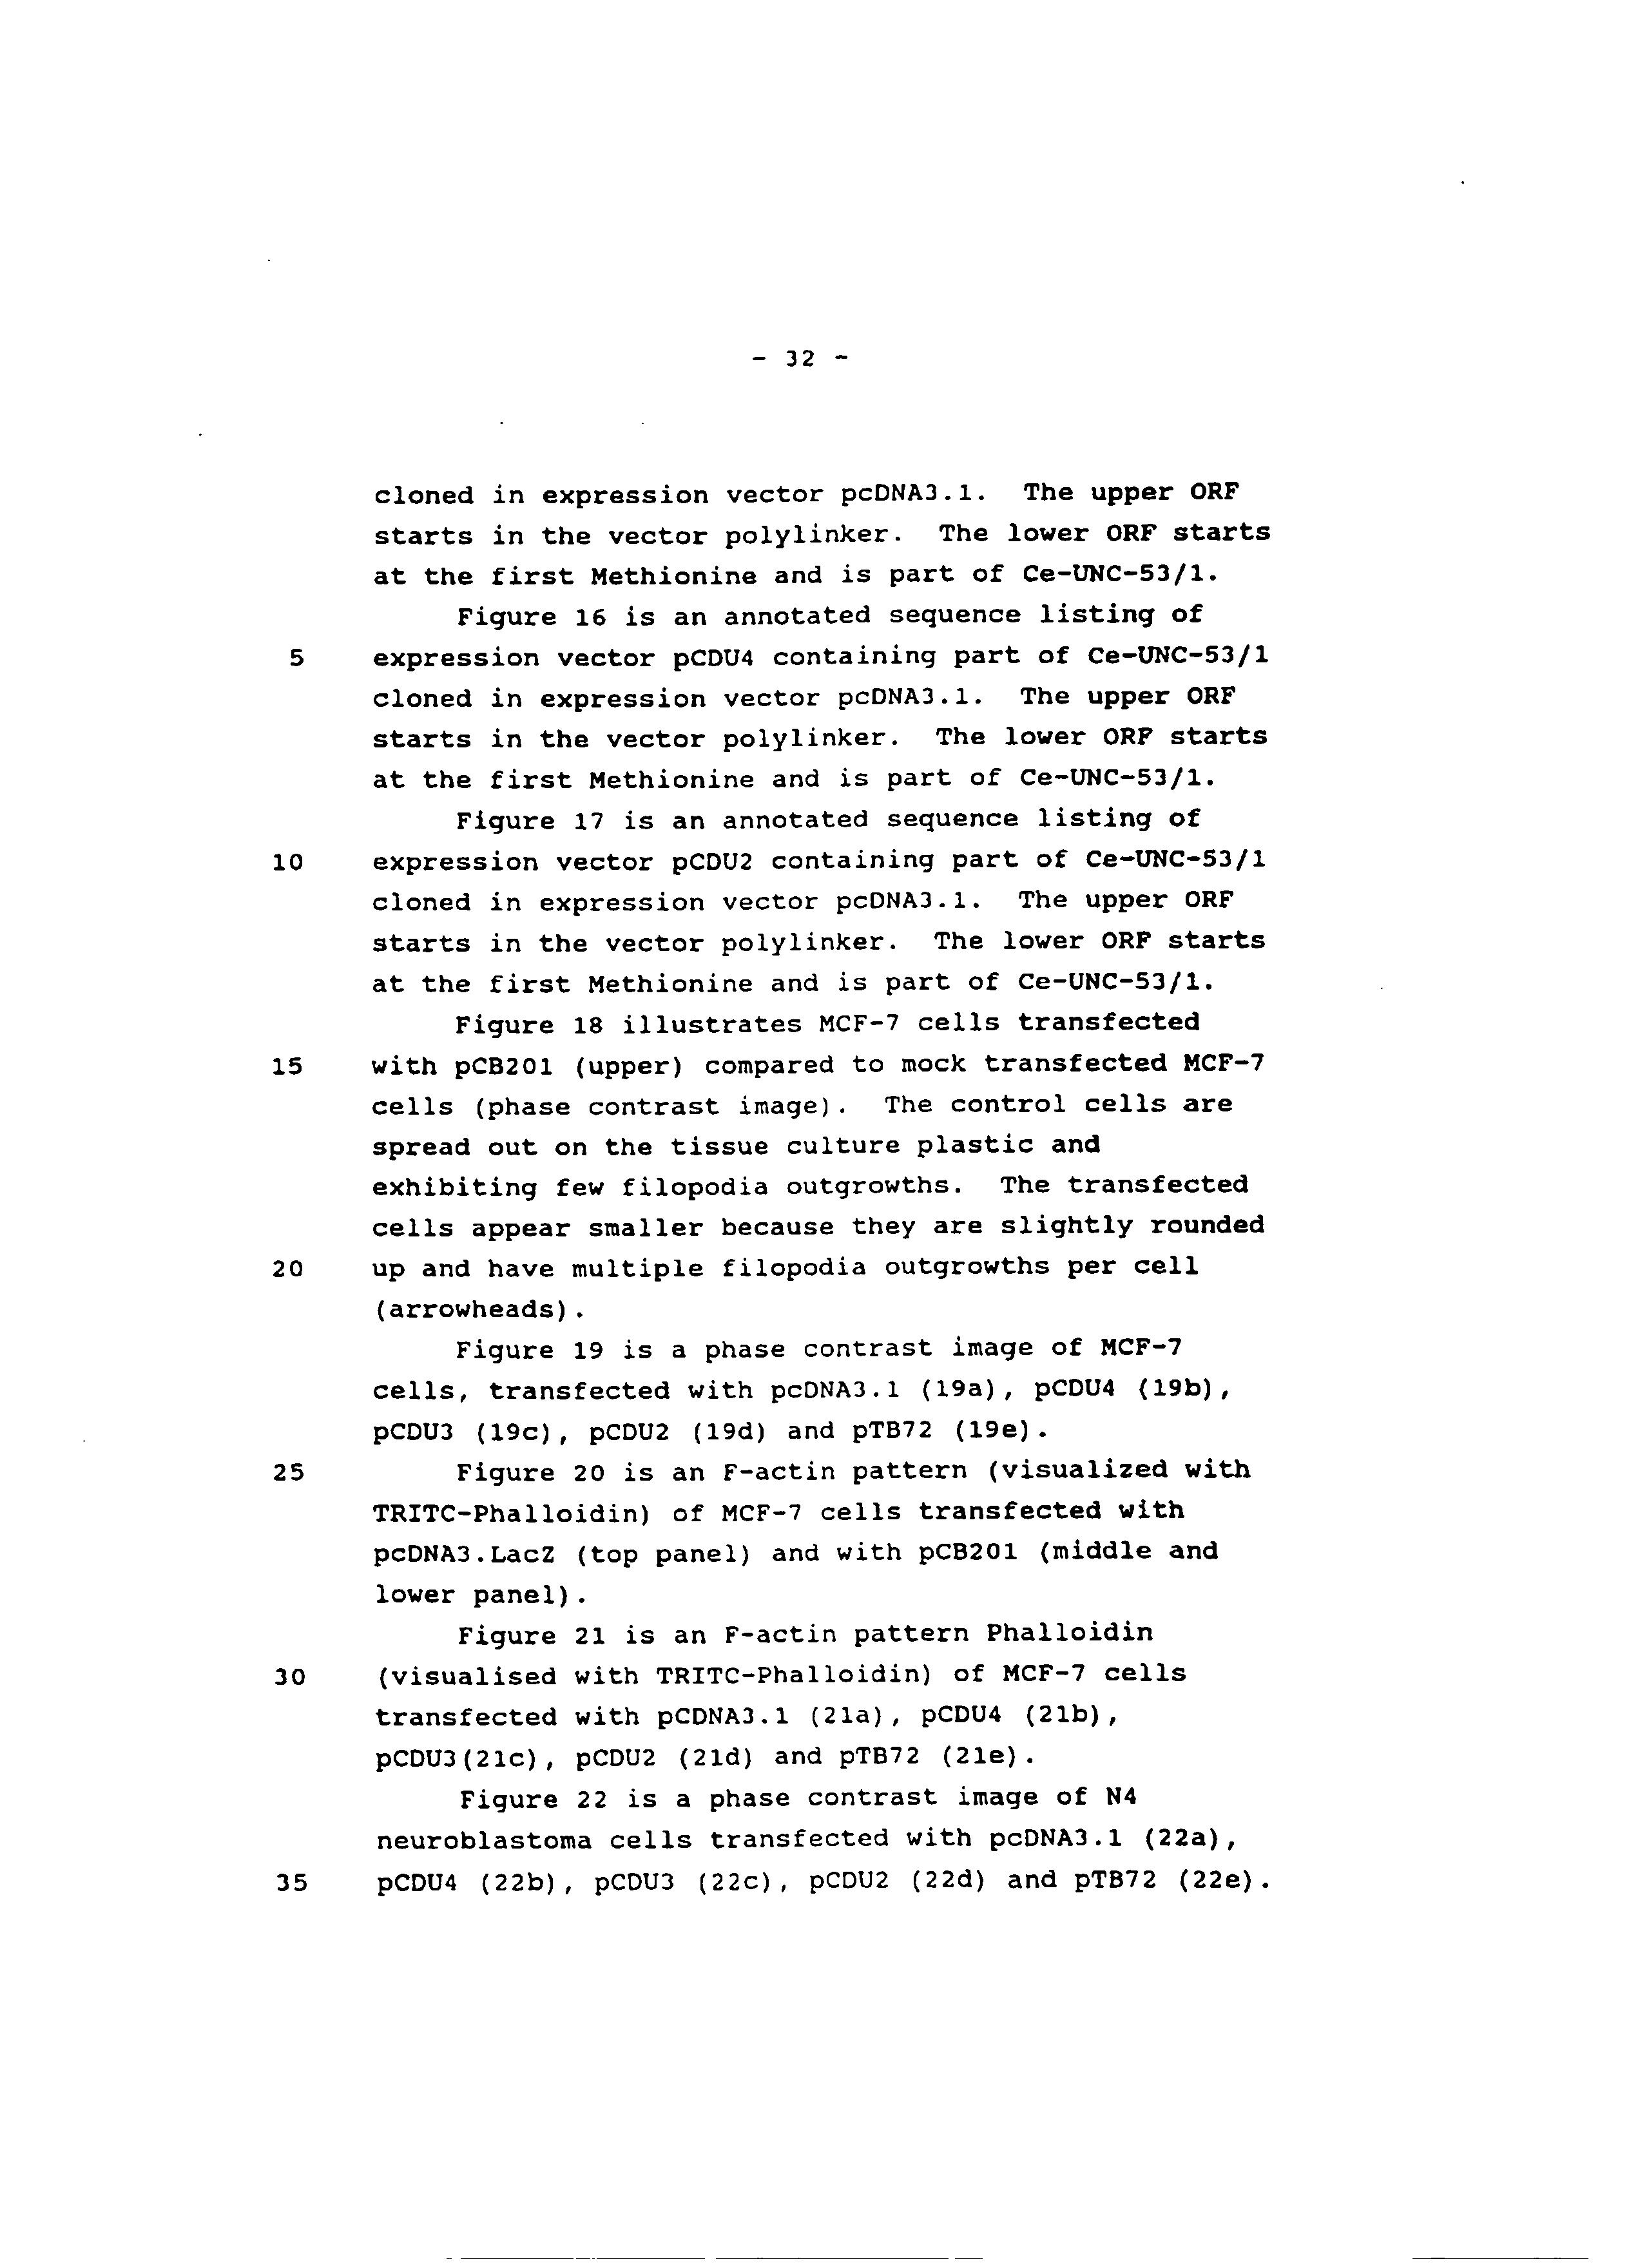 AU 780316 B2 - Vertebrate Homologues Of Unc-53 Protein Of C